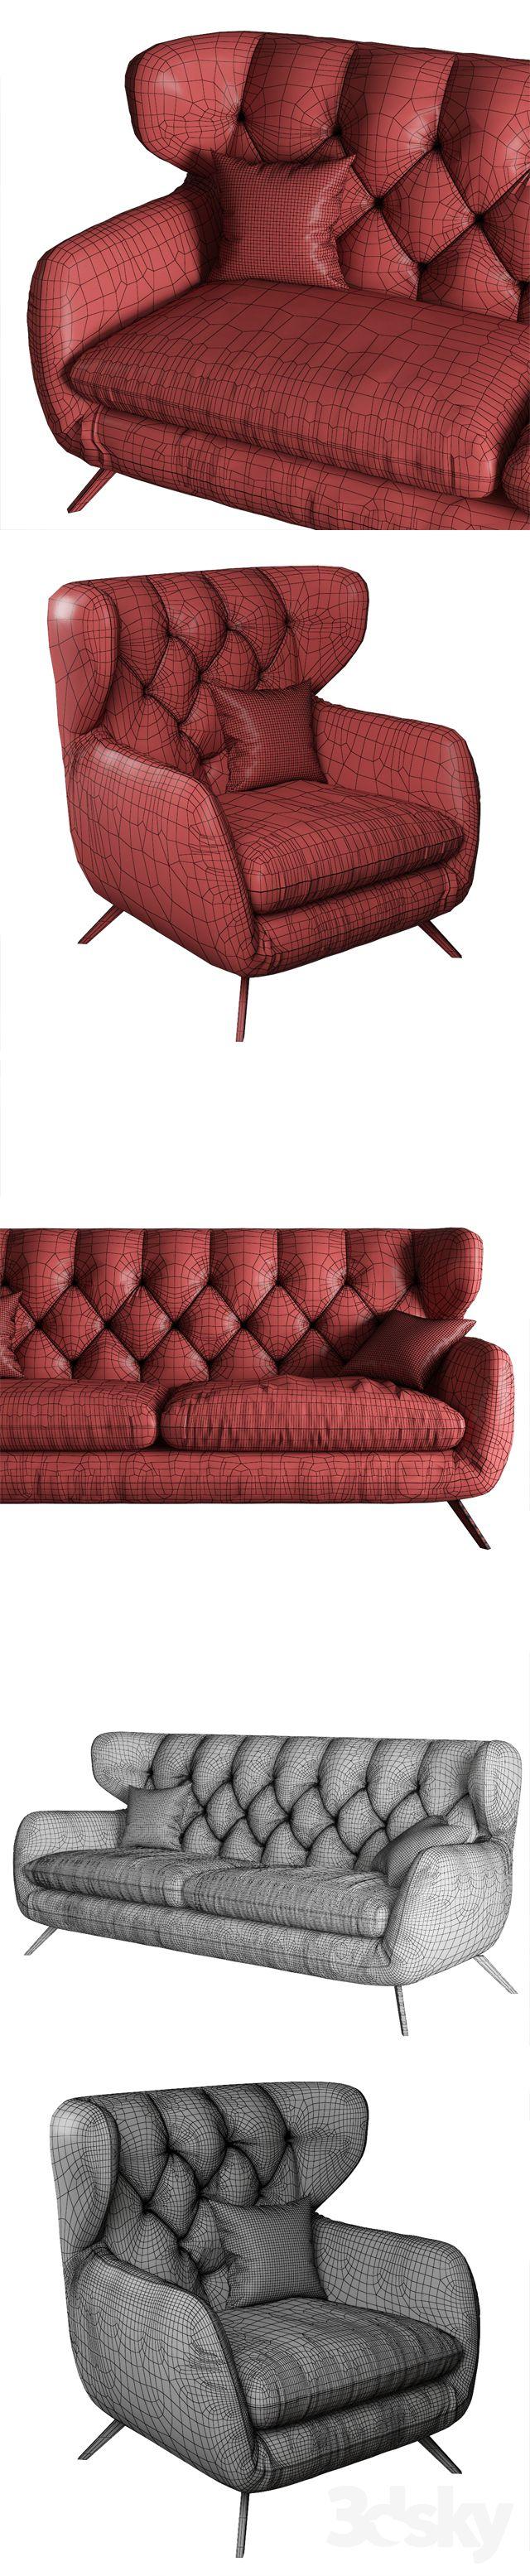 3d Models Sofa 3c Candy Sixty Retro Couch Model 3d Model